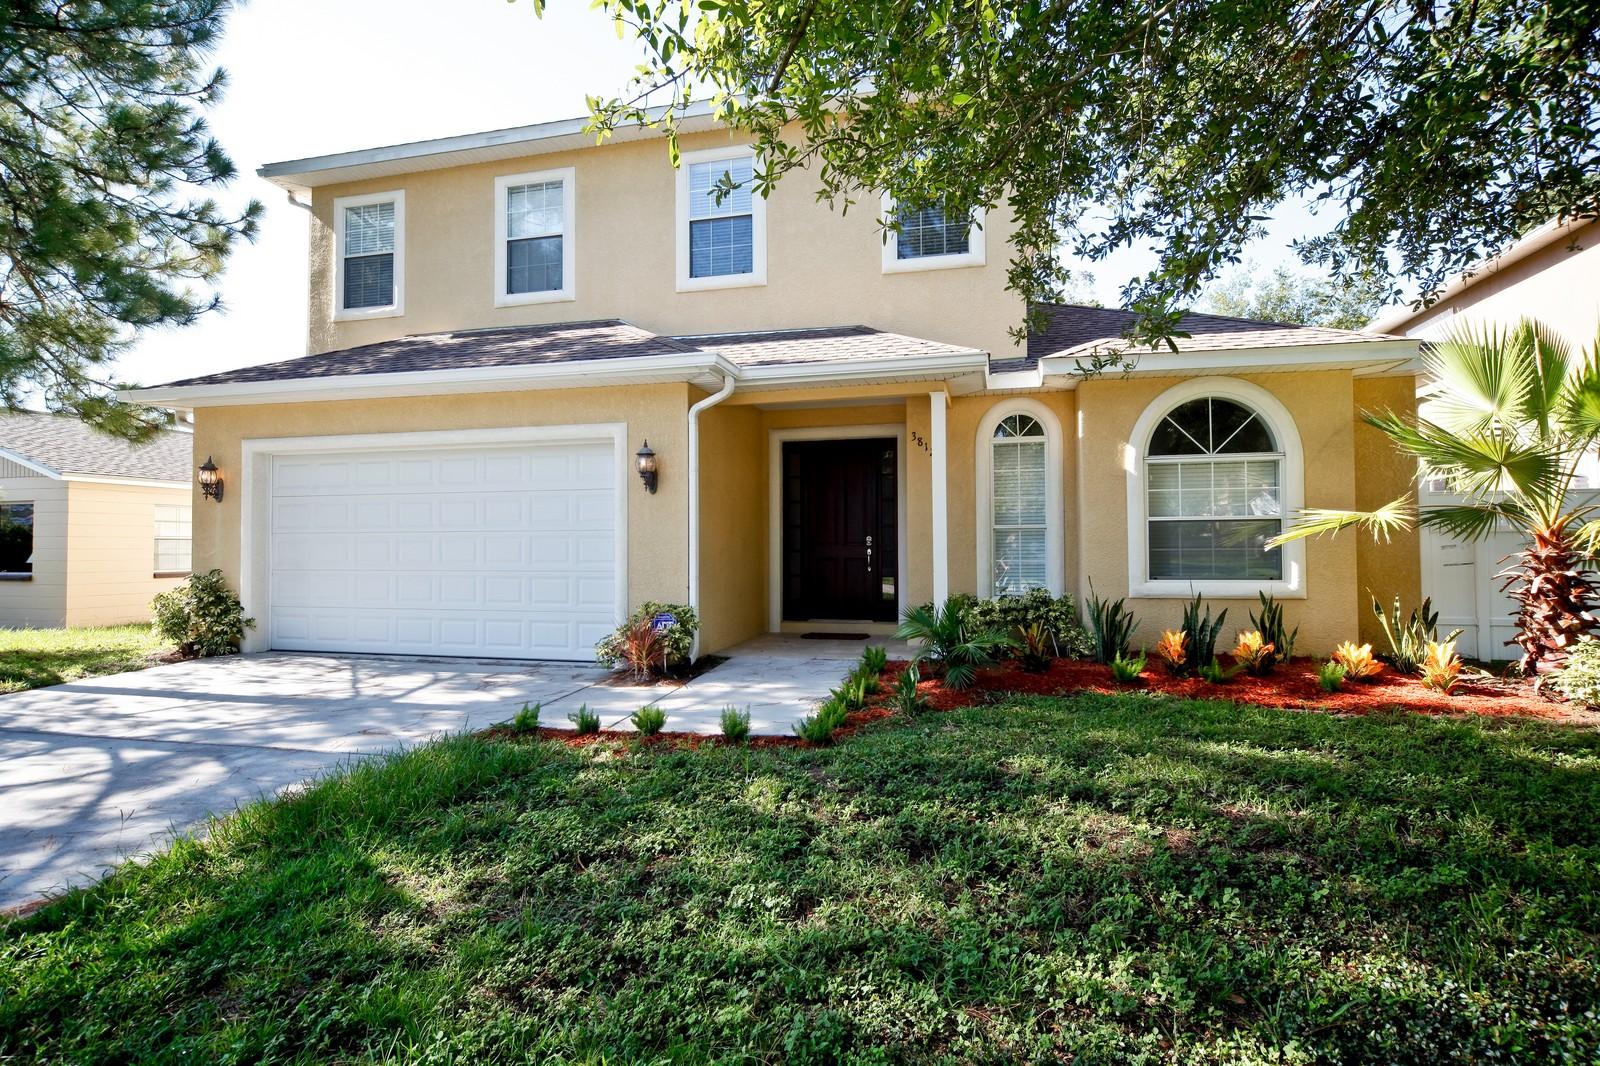 Real Estate Photography - 3812 El Prado Blvd, Tampa, FL, 33629 - Front View